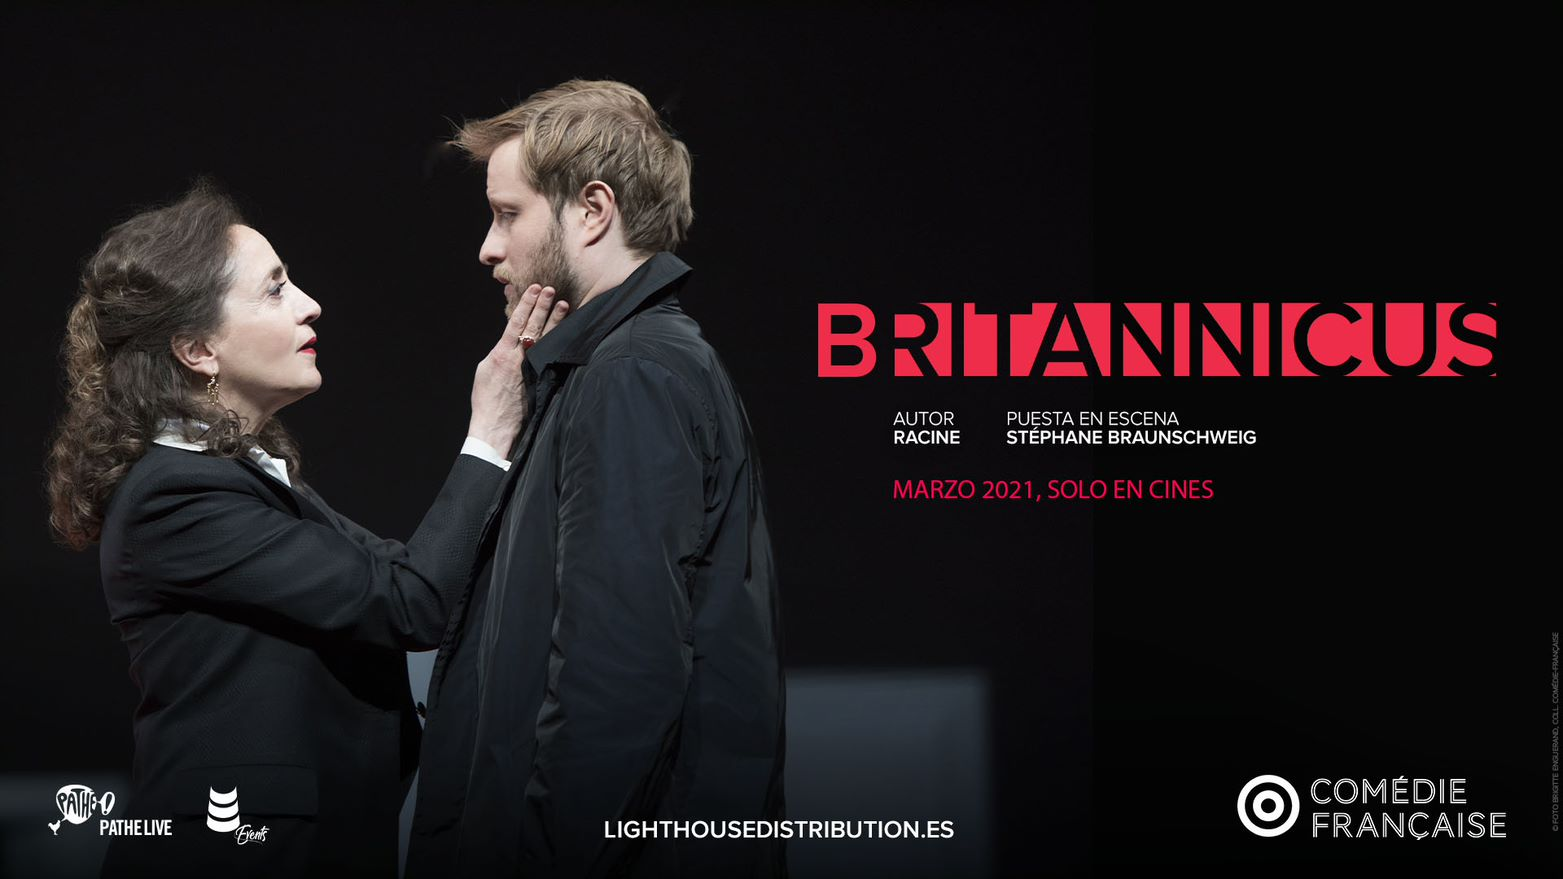 Comédie Française: Británico